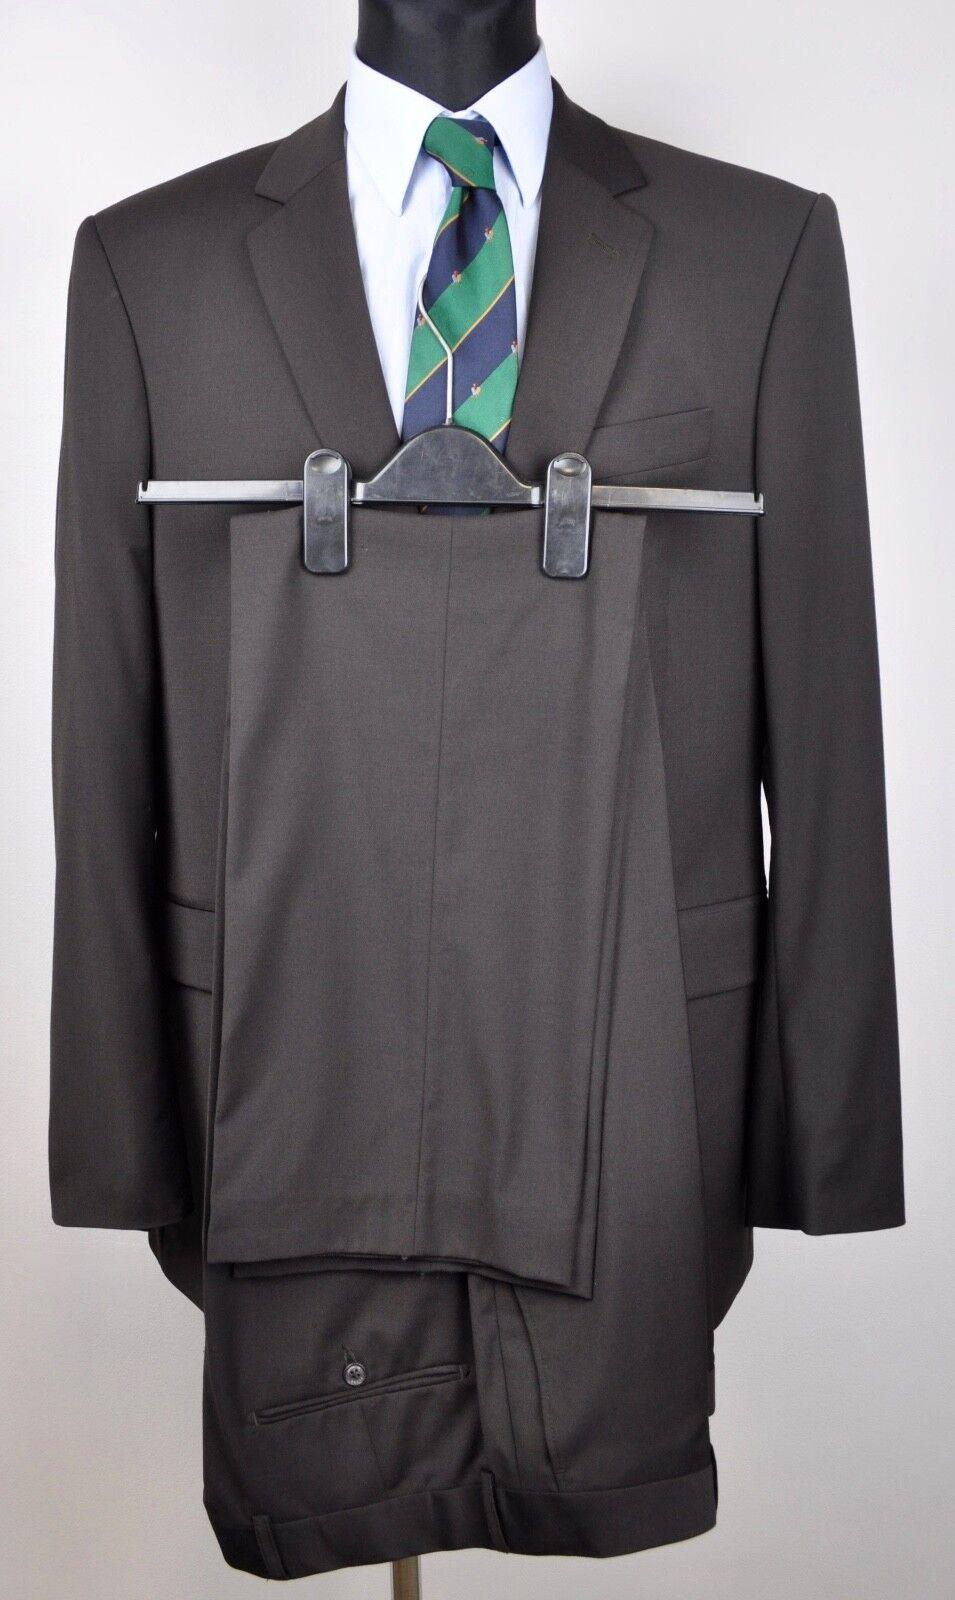 TIGER OF SWEDEN Wool Blend Brown Suit Size 152 Blazer 150 Pants W35 L33 Trousers